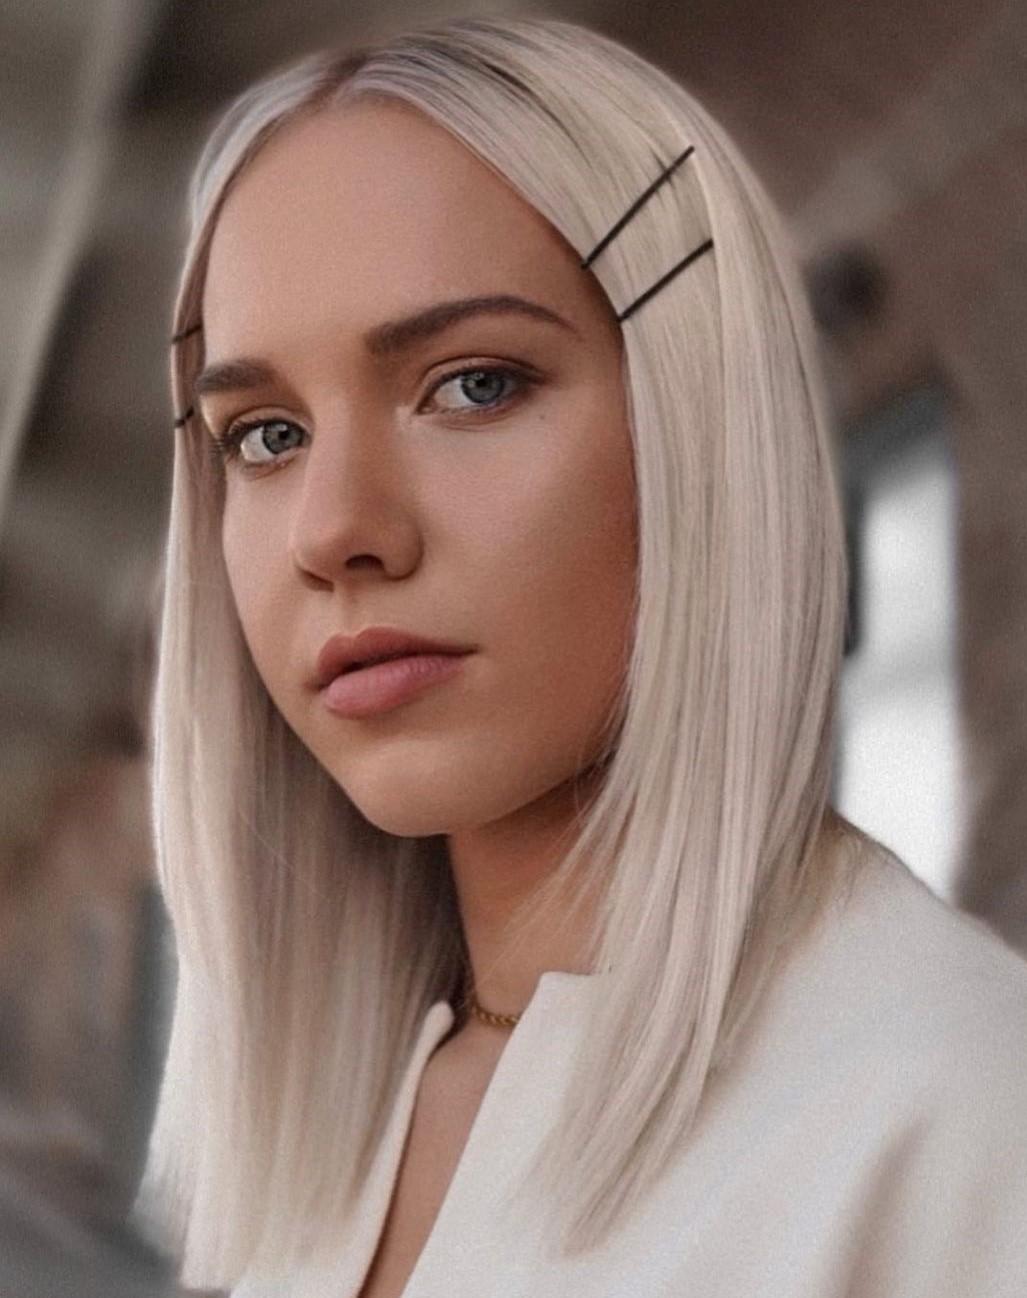 Medium-Length Straight Hairstyle